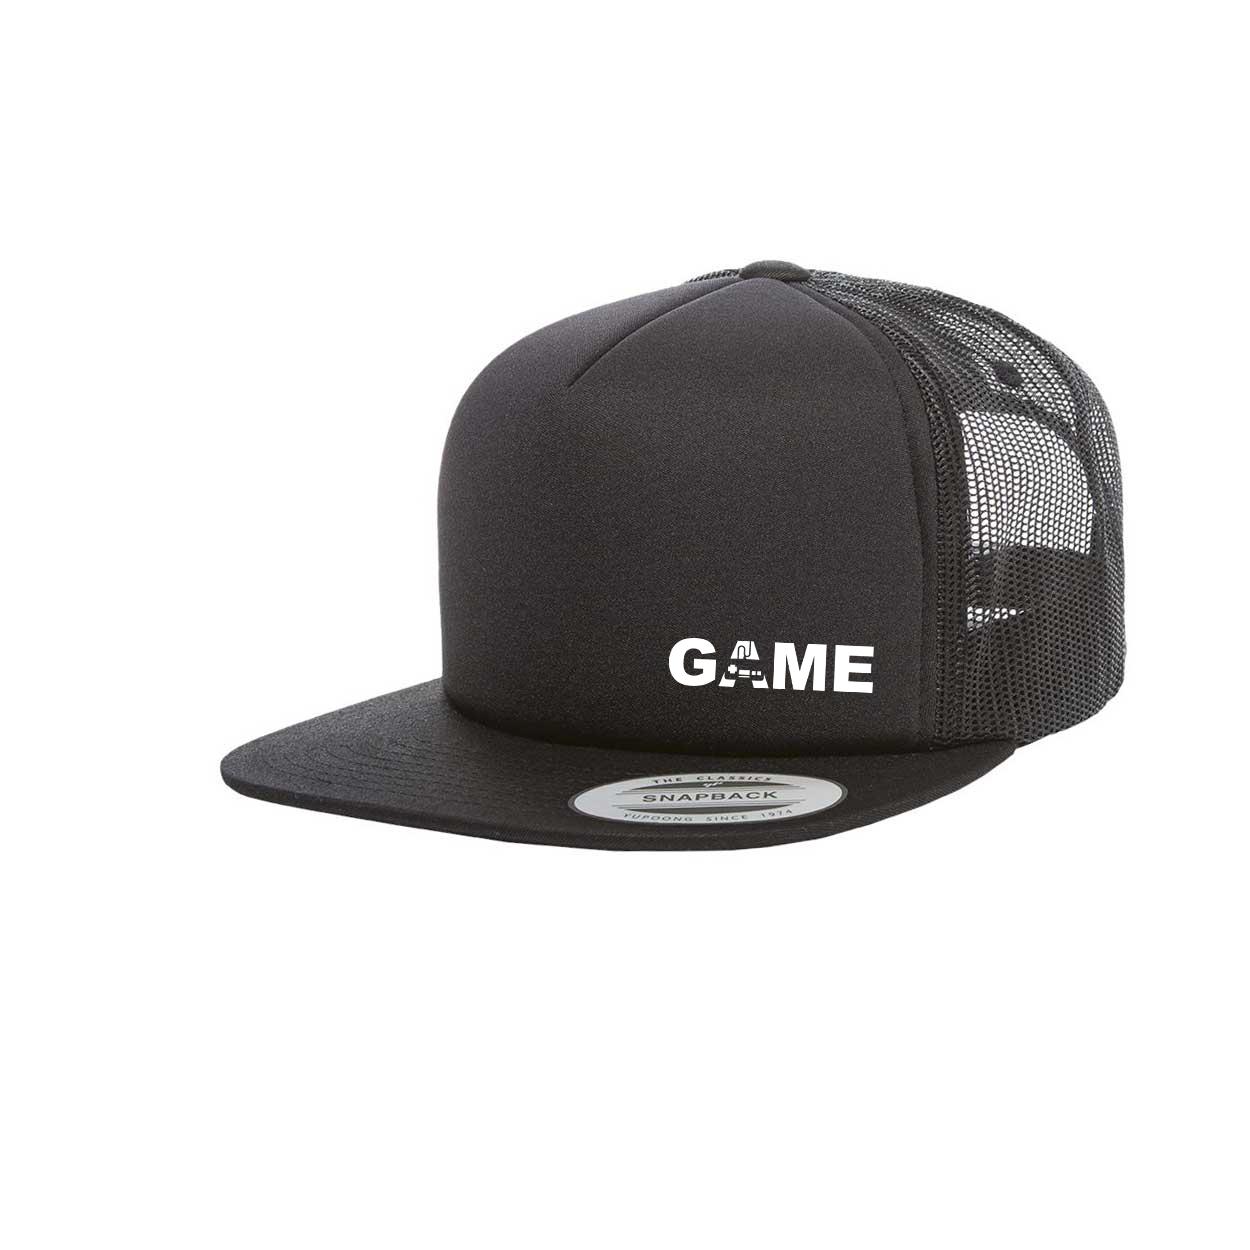 Game Controller Logo Night Out Premium Foam Flat Brim Snapback Hat Black (White Logo)